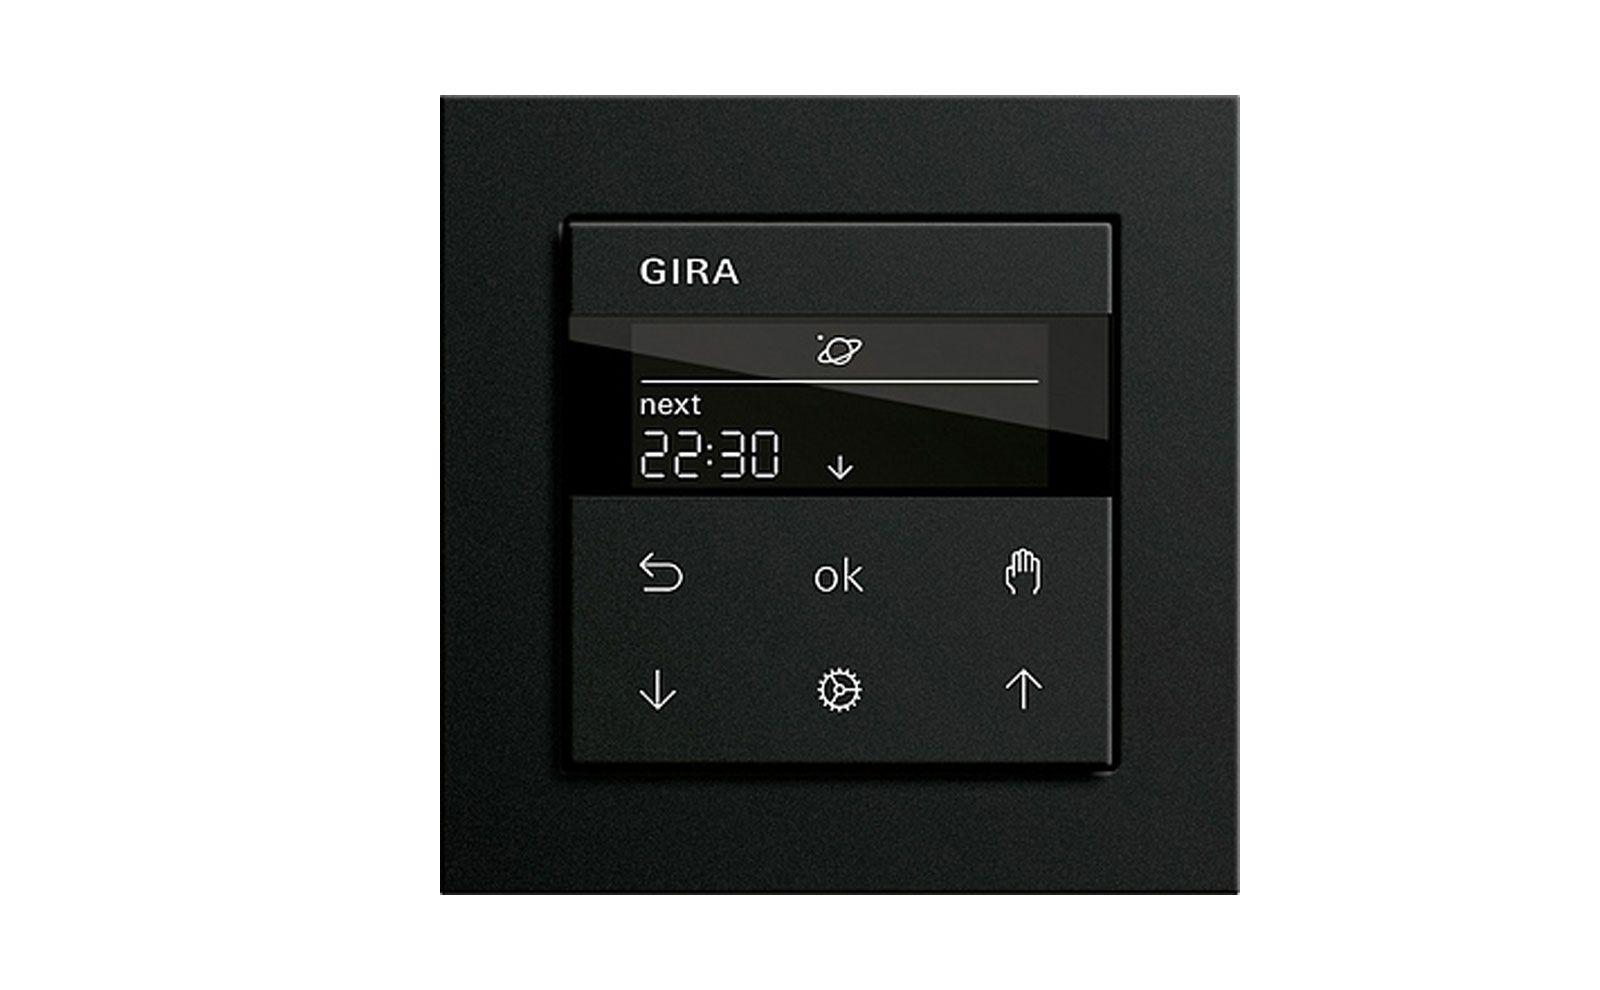 System-3000-Jalousiesteuerung-Display_19416_1558354706.jpg